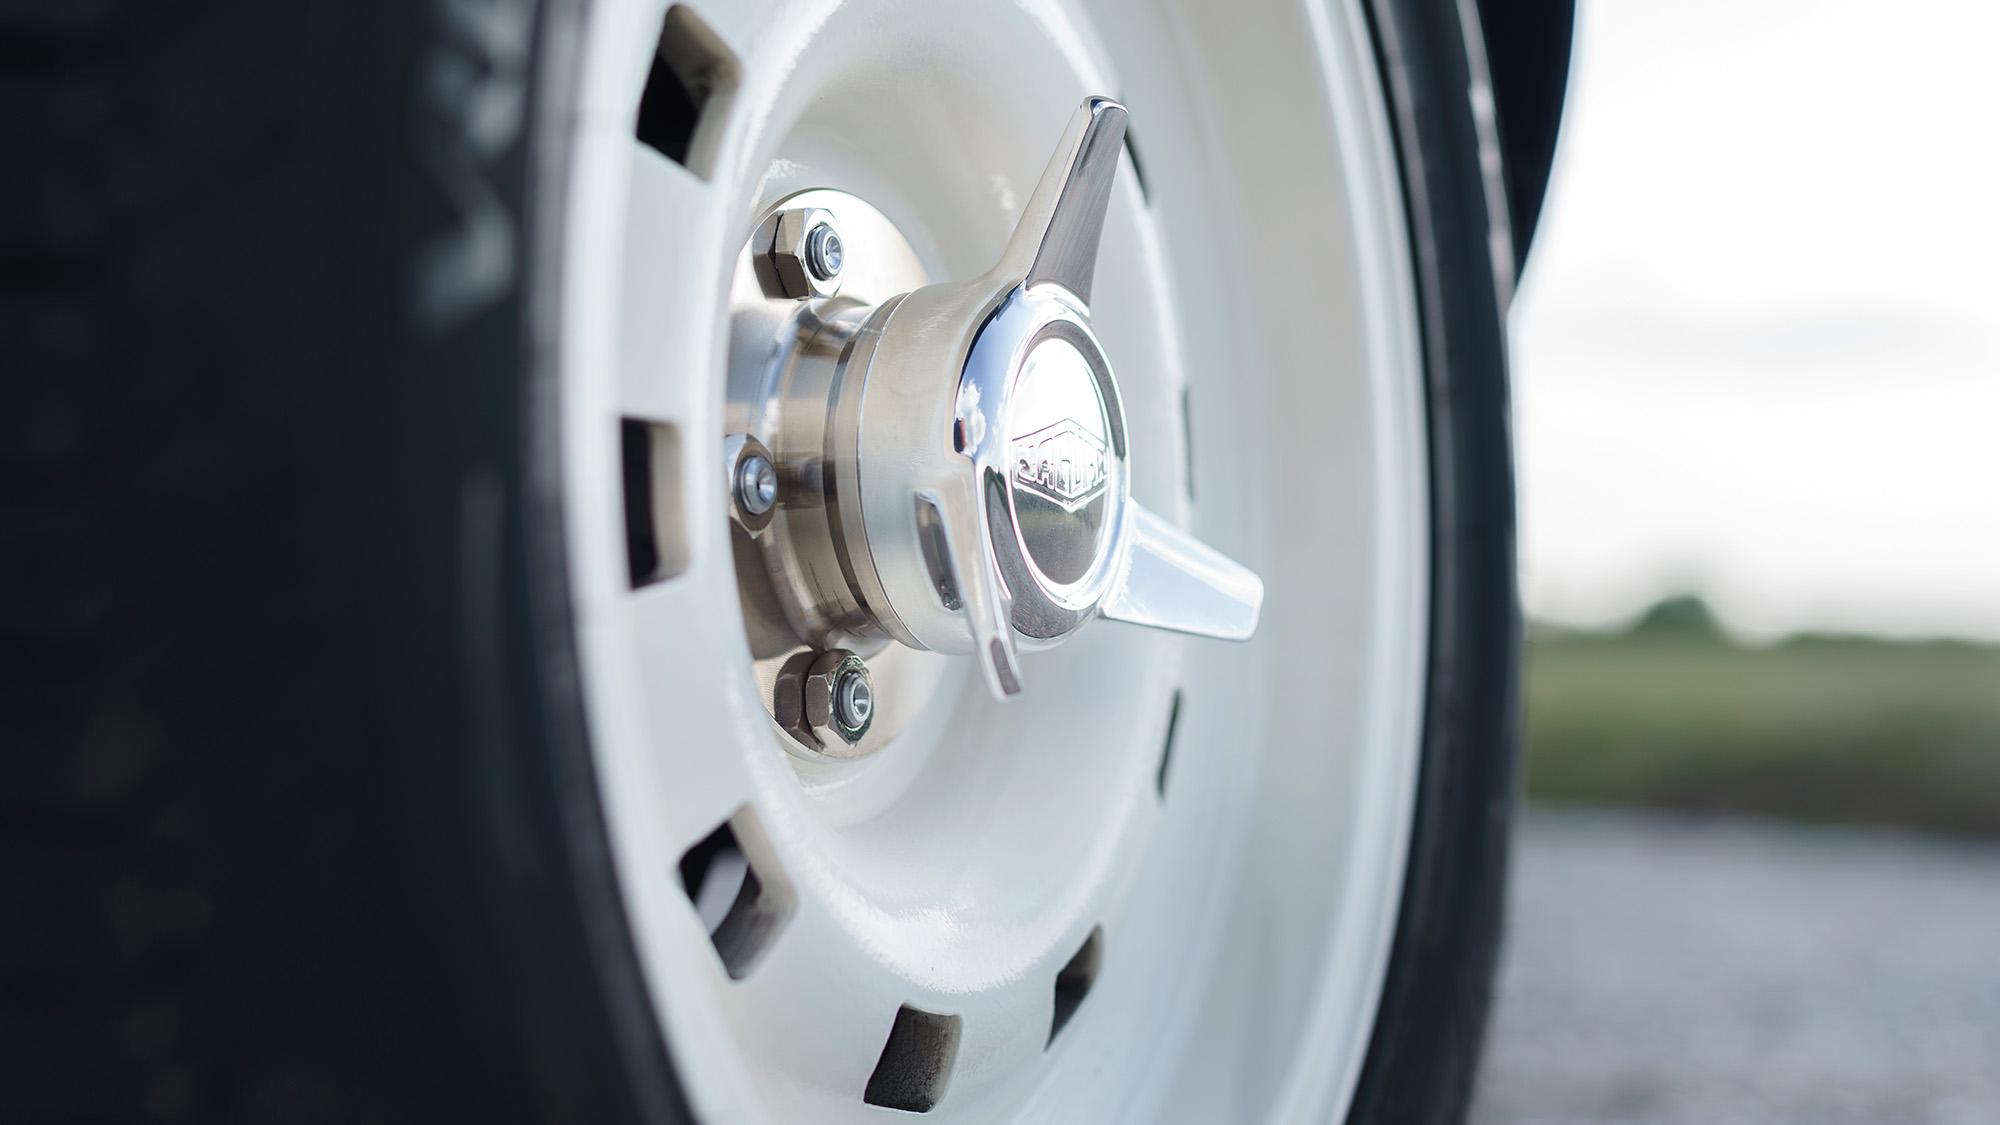 Wheel hub of the 2020 Eagle E-type Lightweight GT